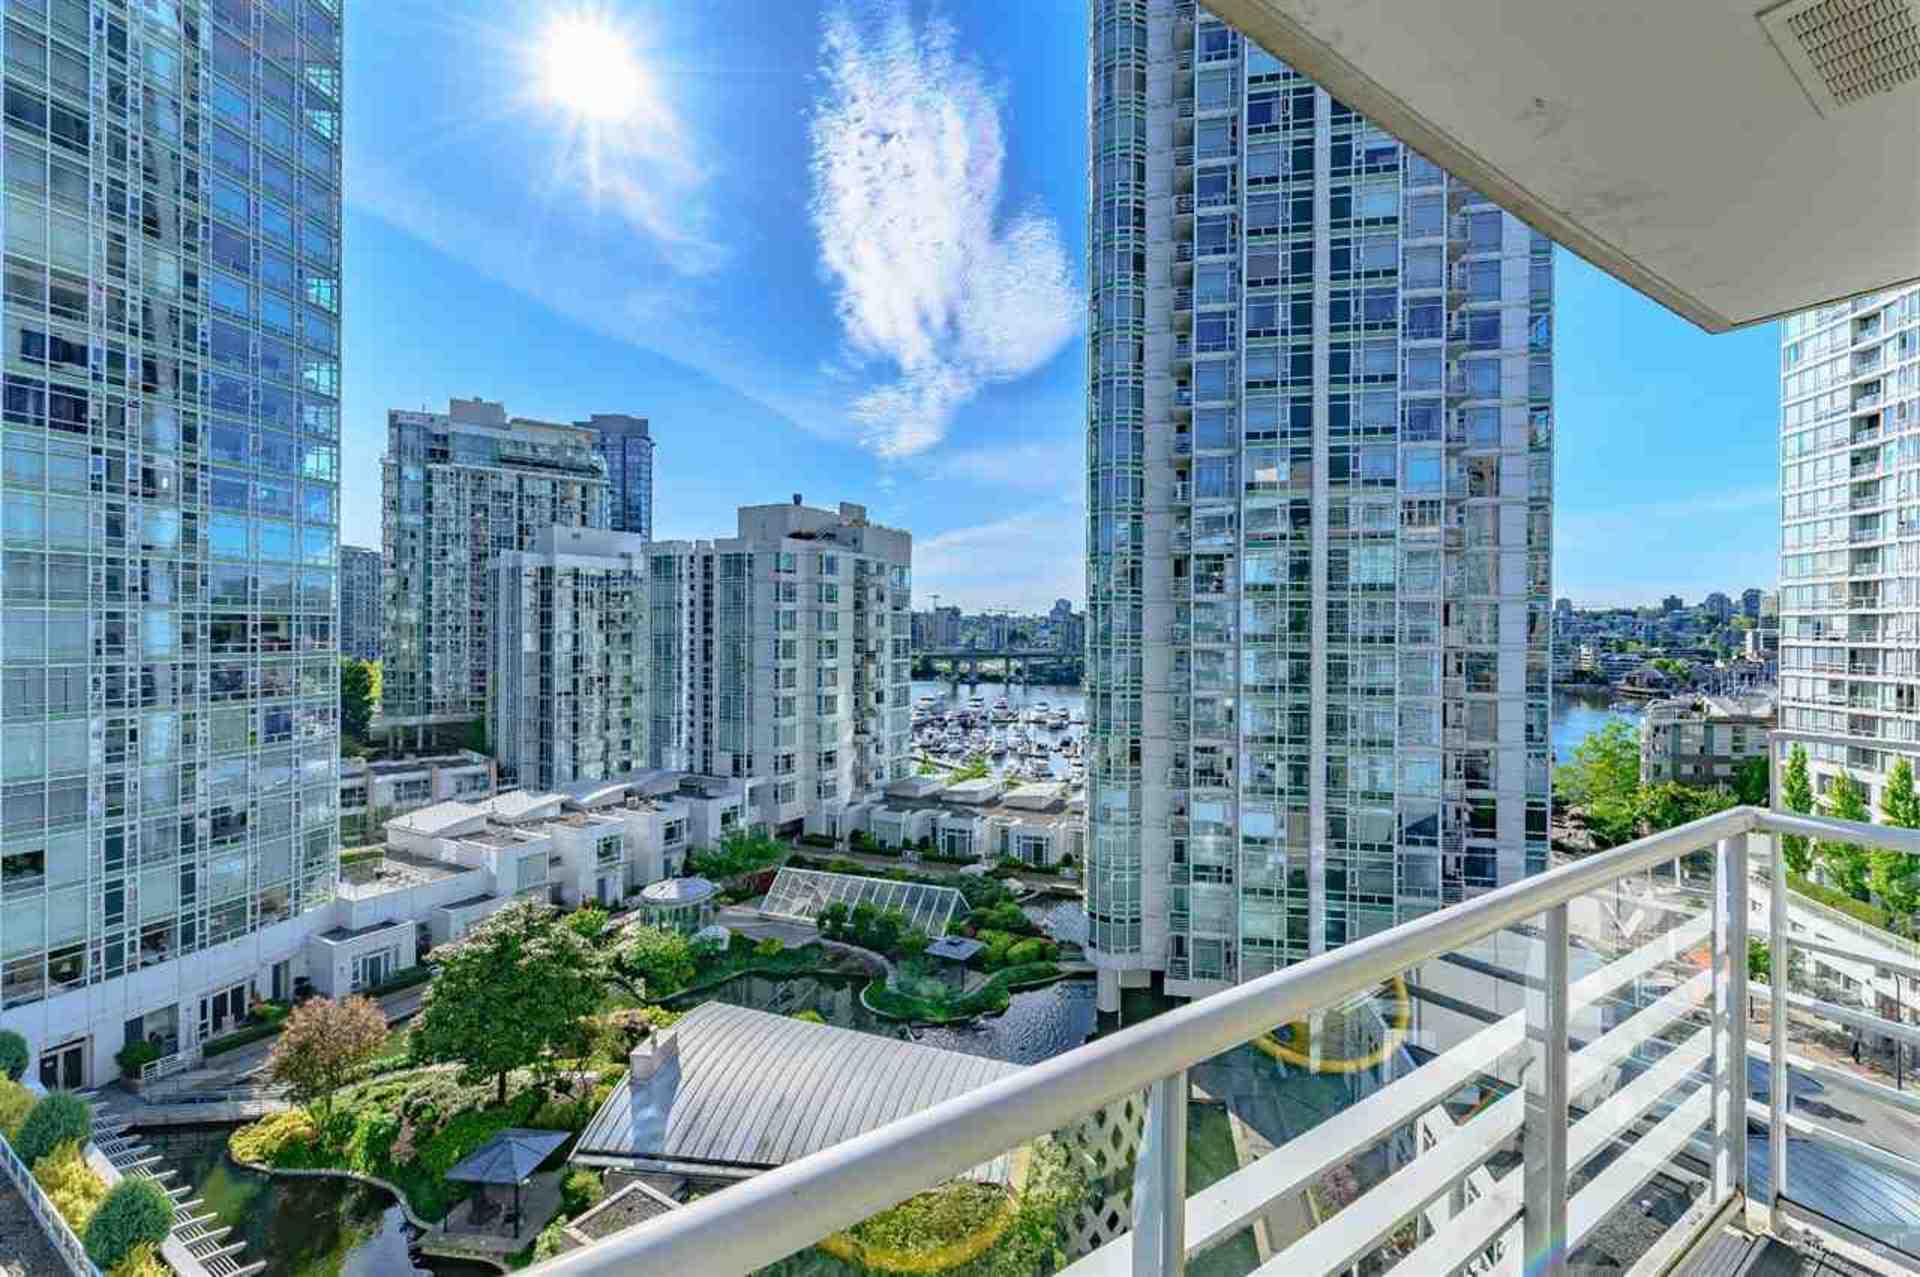 189-davie-street-yaletown-vancouver-west-07 at 1105 - 189 Davie Street, Yaletown, Vancouver West